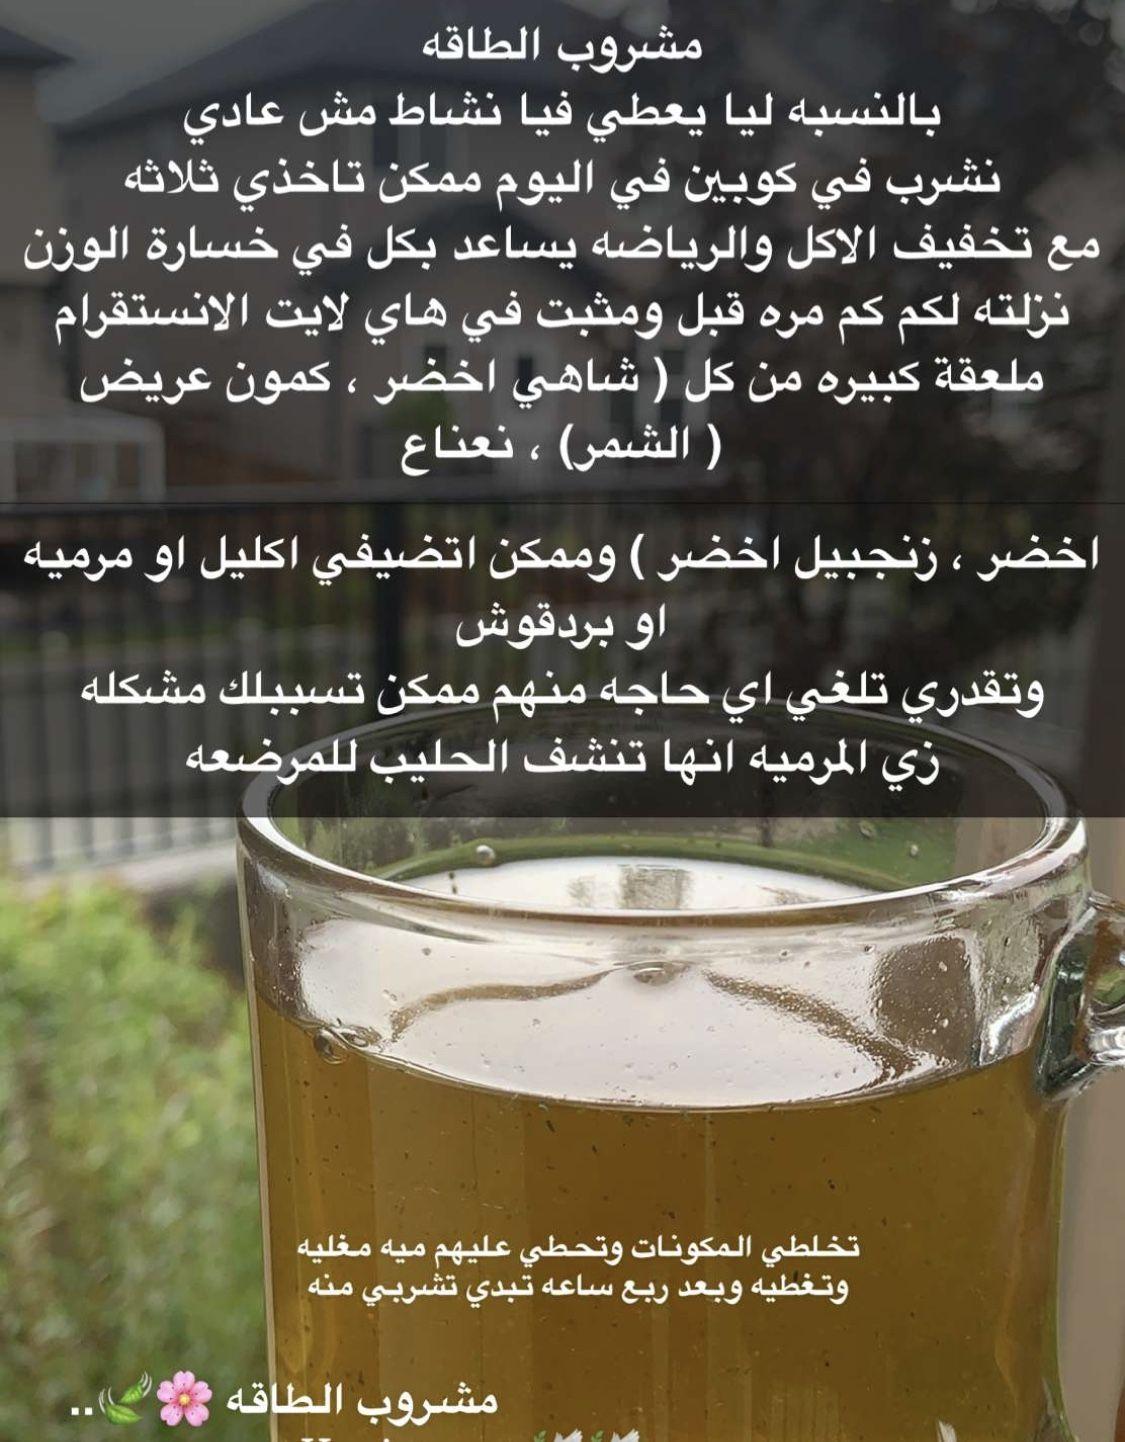 Pin By Ghnj Alshmry On وصفات ابيس الدغا Glassware Tableware Health